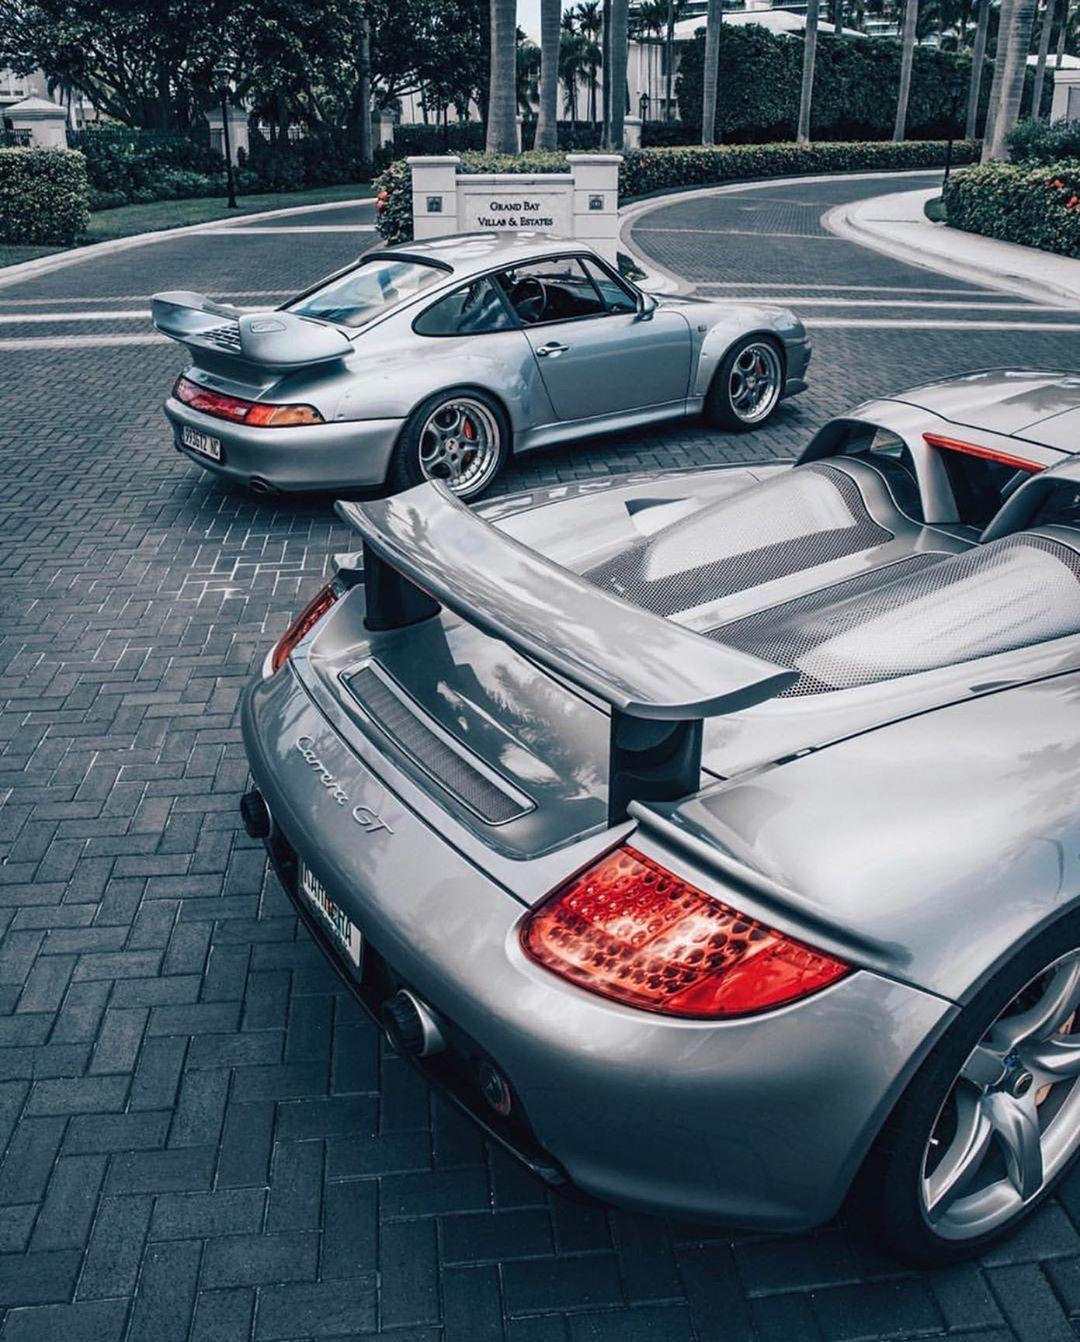 993 Gt2 Or Carrera Gt By Instaexotics Porsche Porsche911 911 964 993 930 996 Carreragt порше ポルシェ カレラ Porsche 911 Porsche Classic Porsche